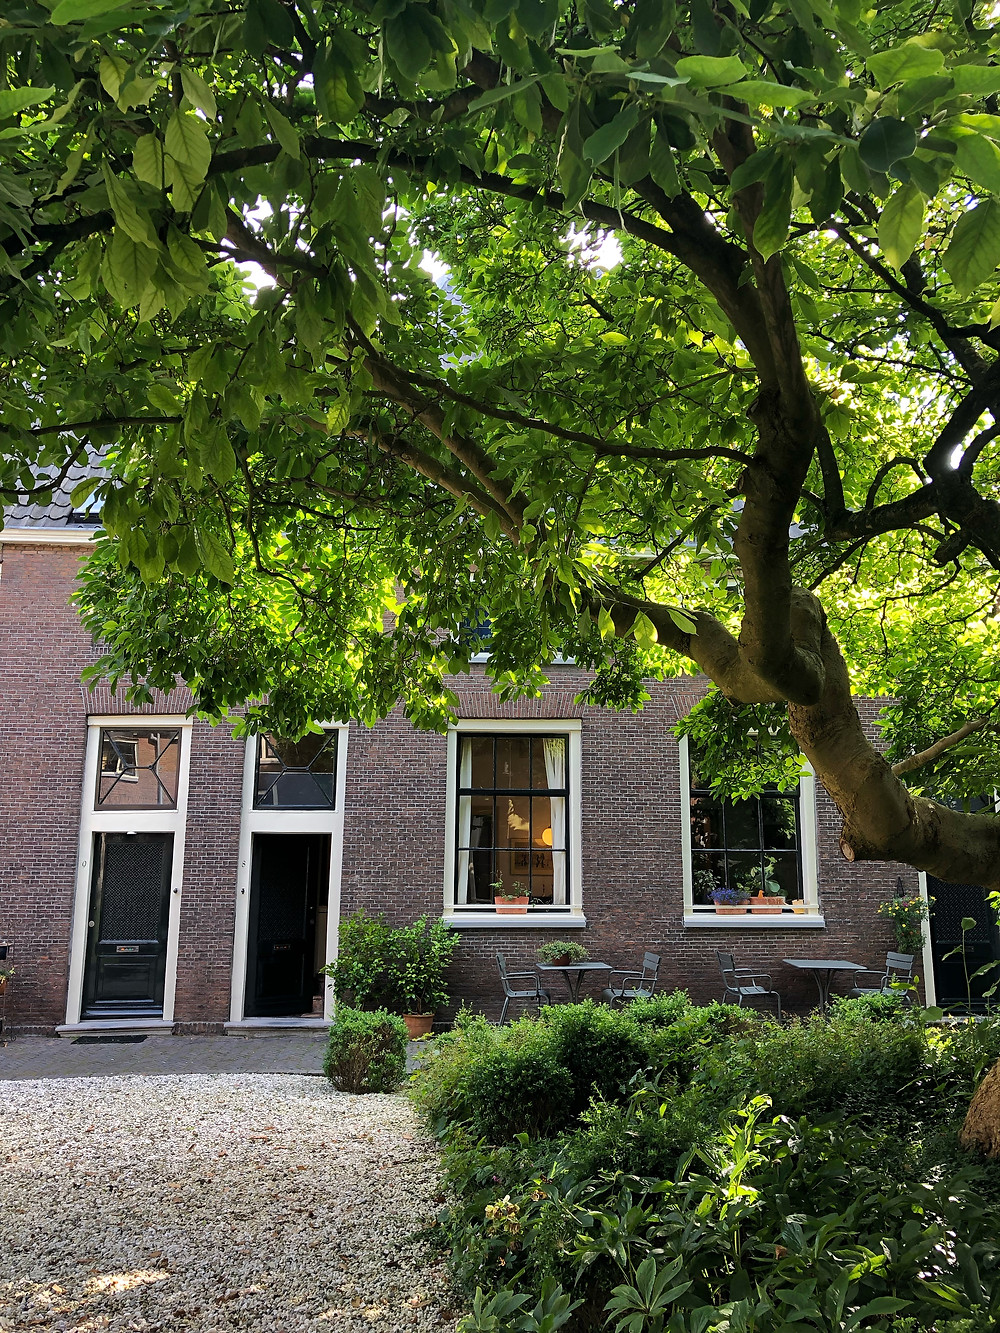 Courtyard garden of Jean Pesijnhofje in Leiden